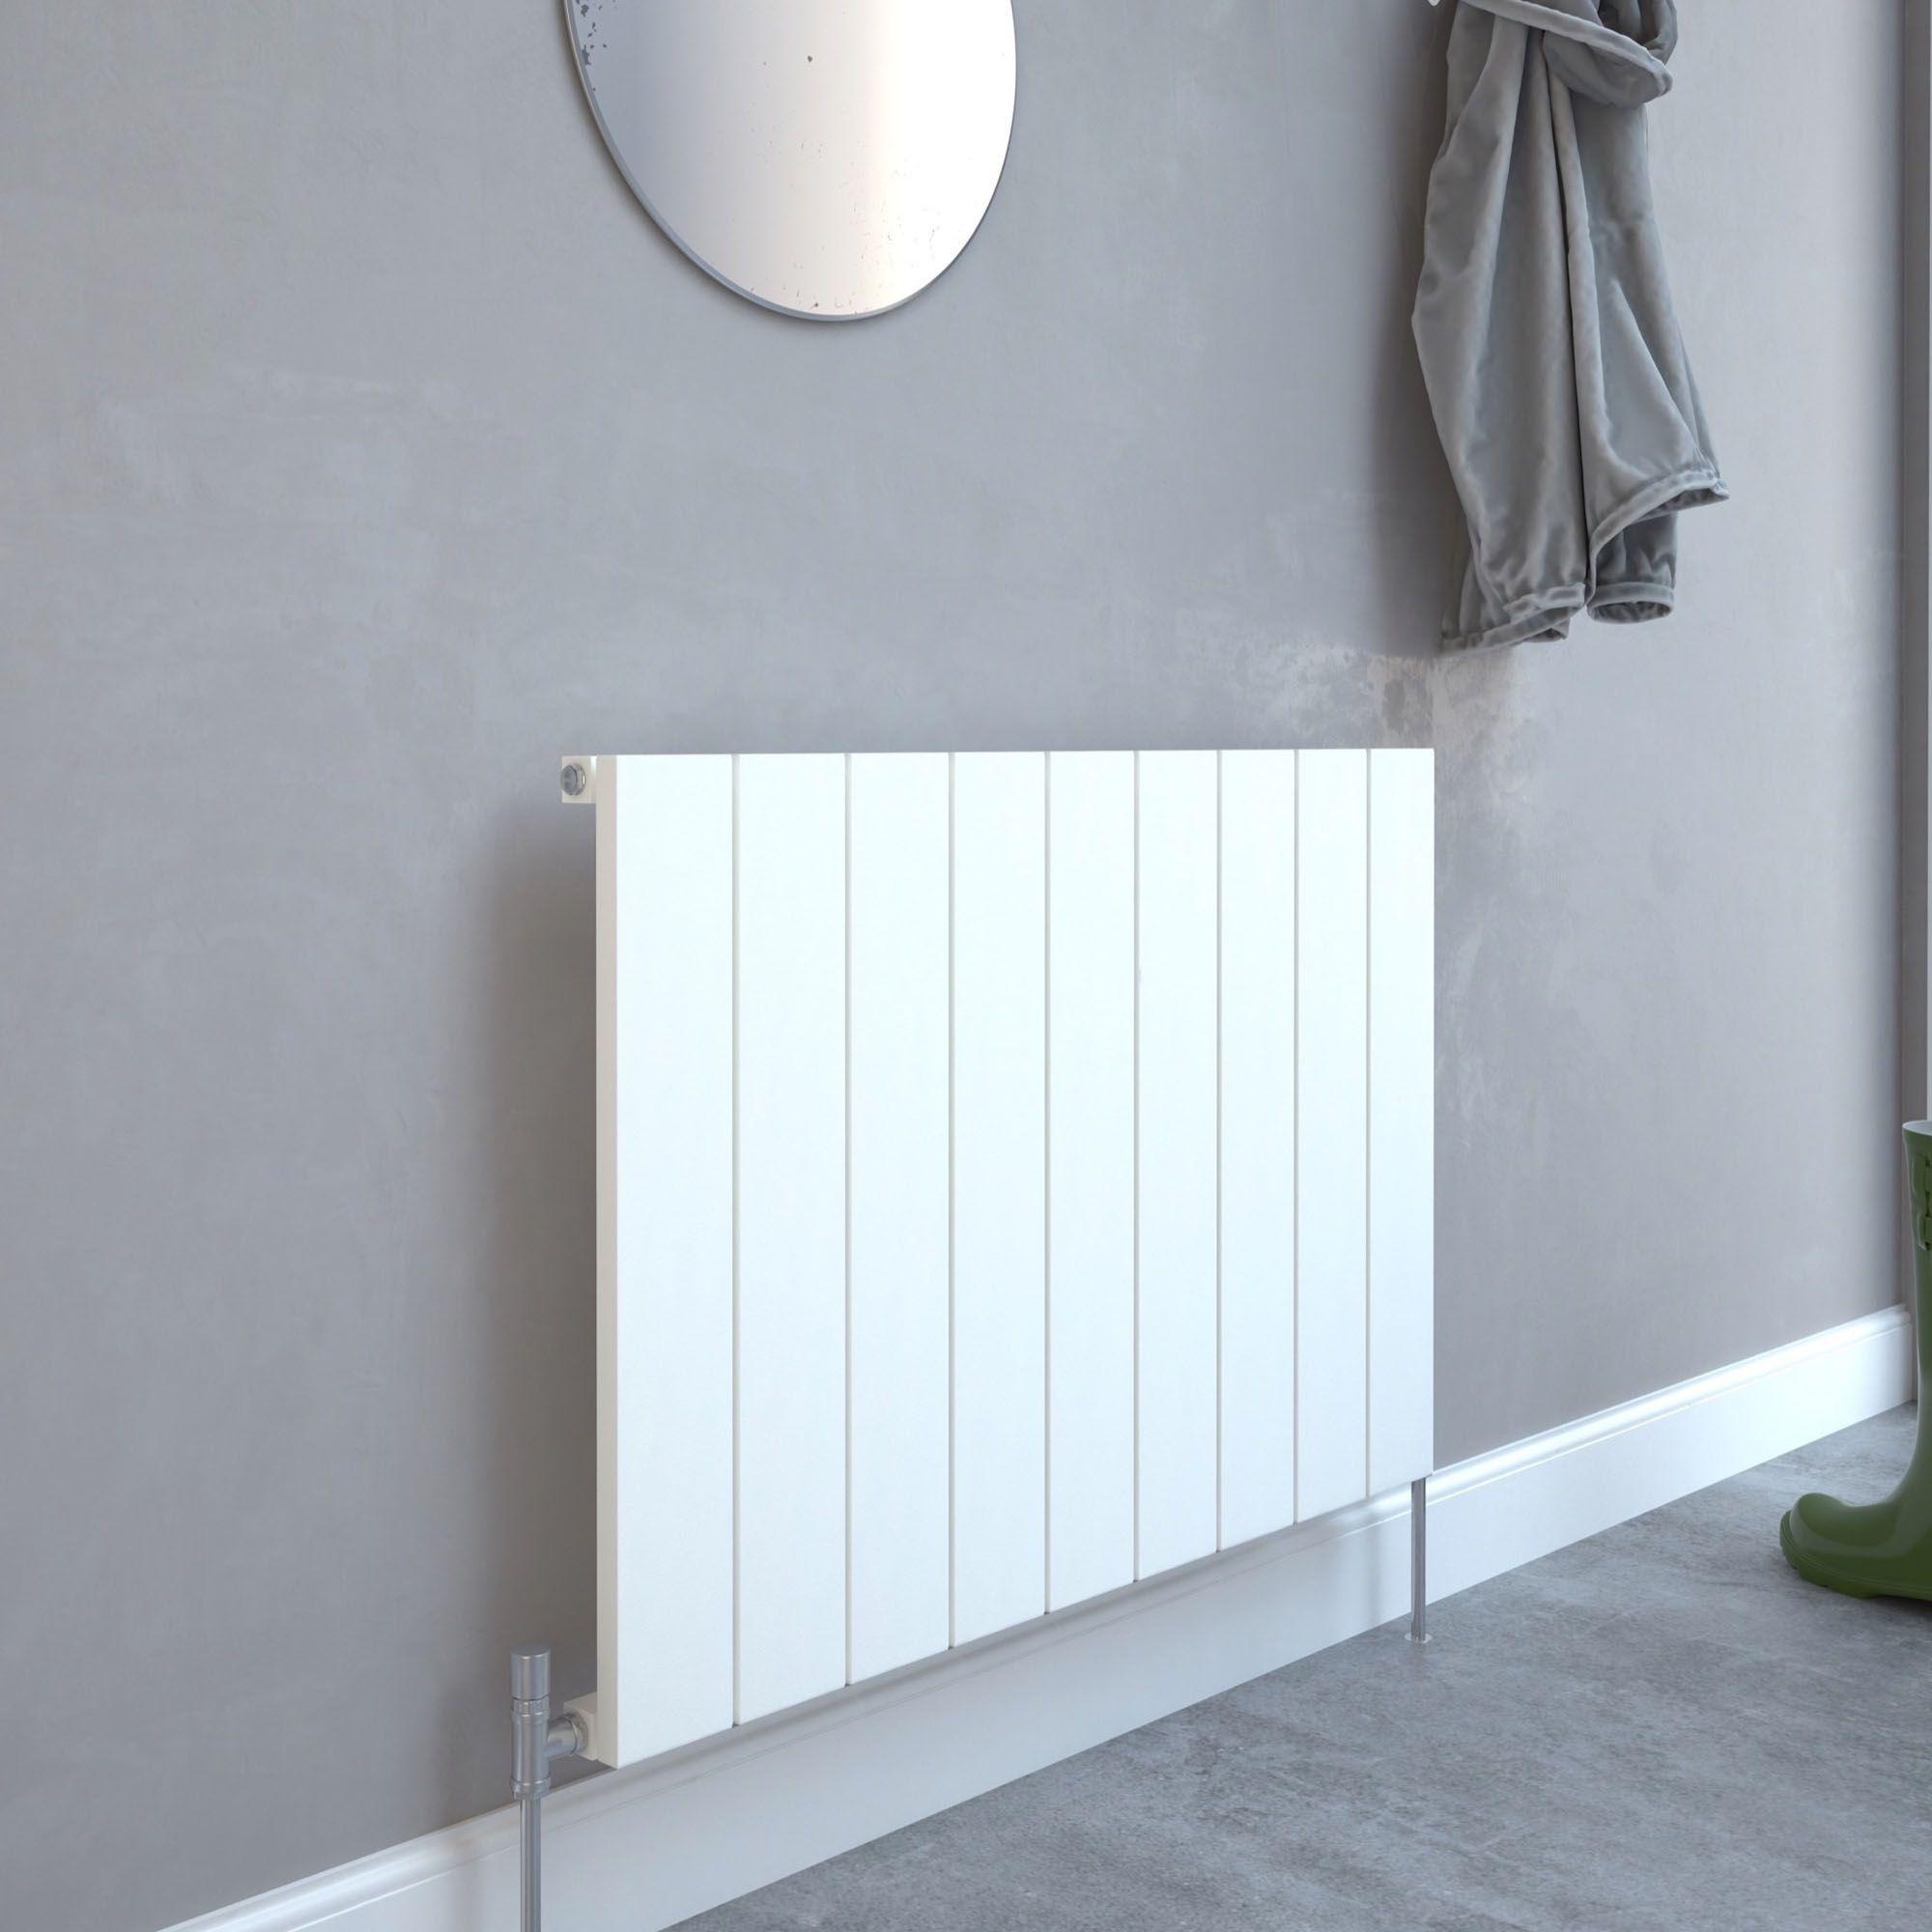 Kudox AluLite Flat Designer radiator White, (H)600mm (W)850mm